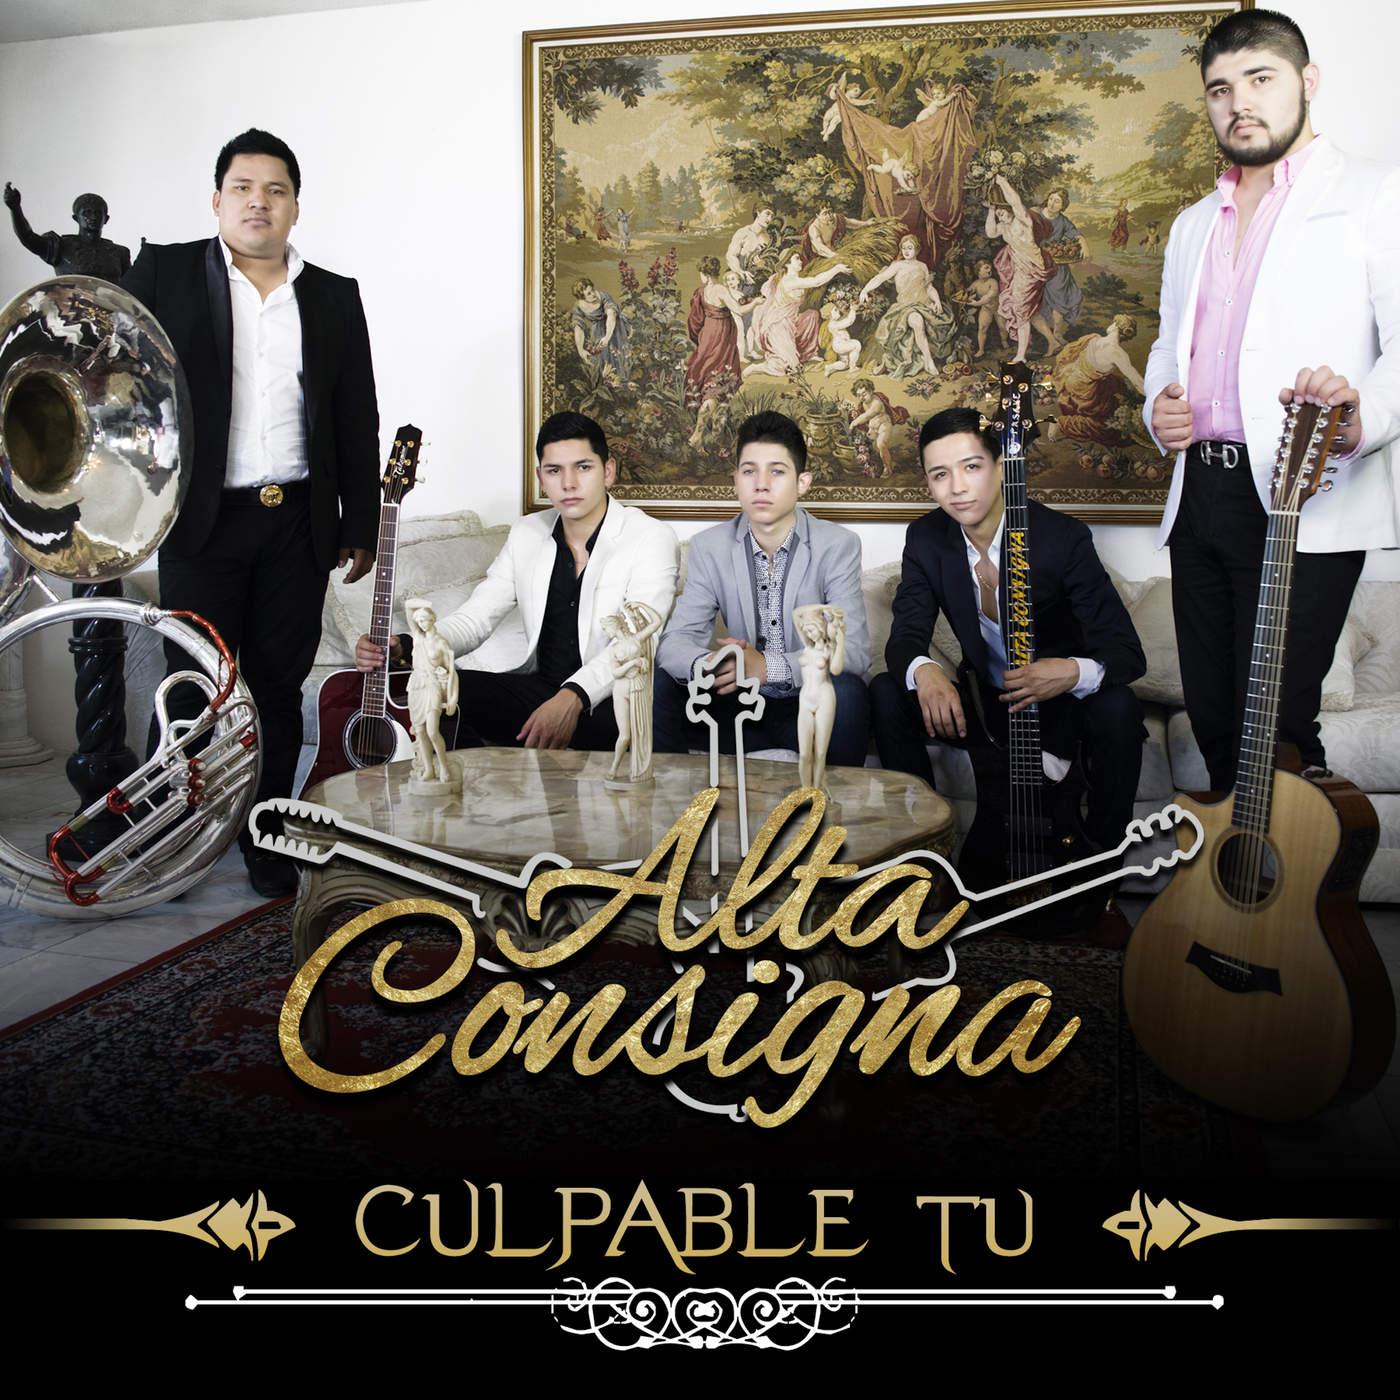 Alta Consigna - Culpable Tu (Disco 2016)